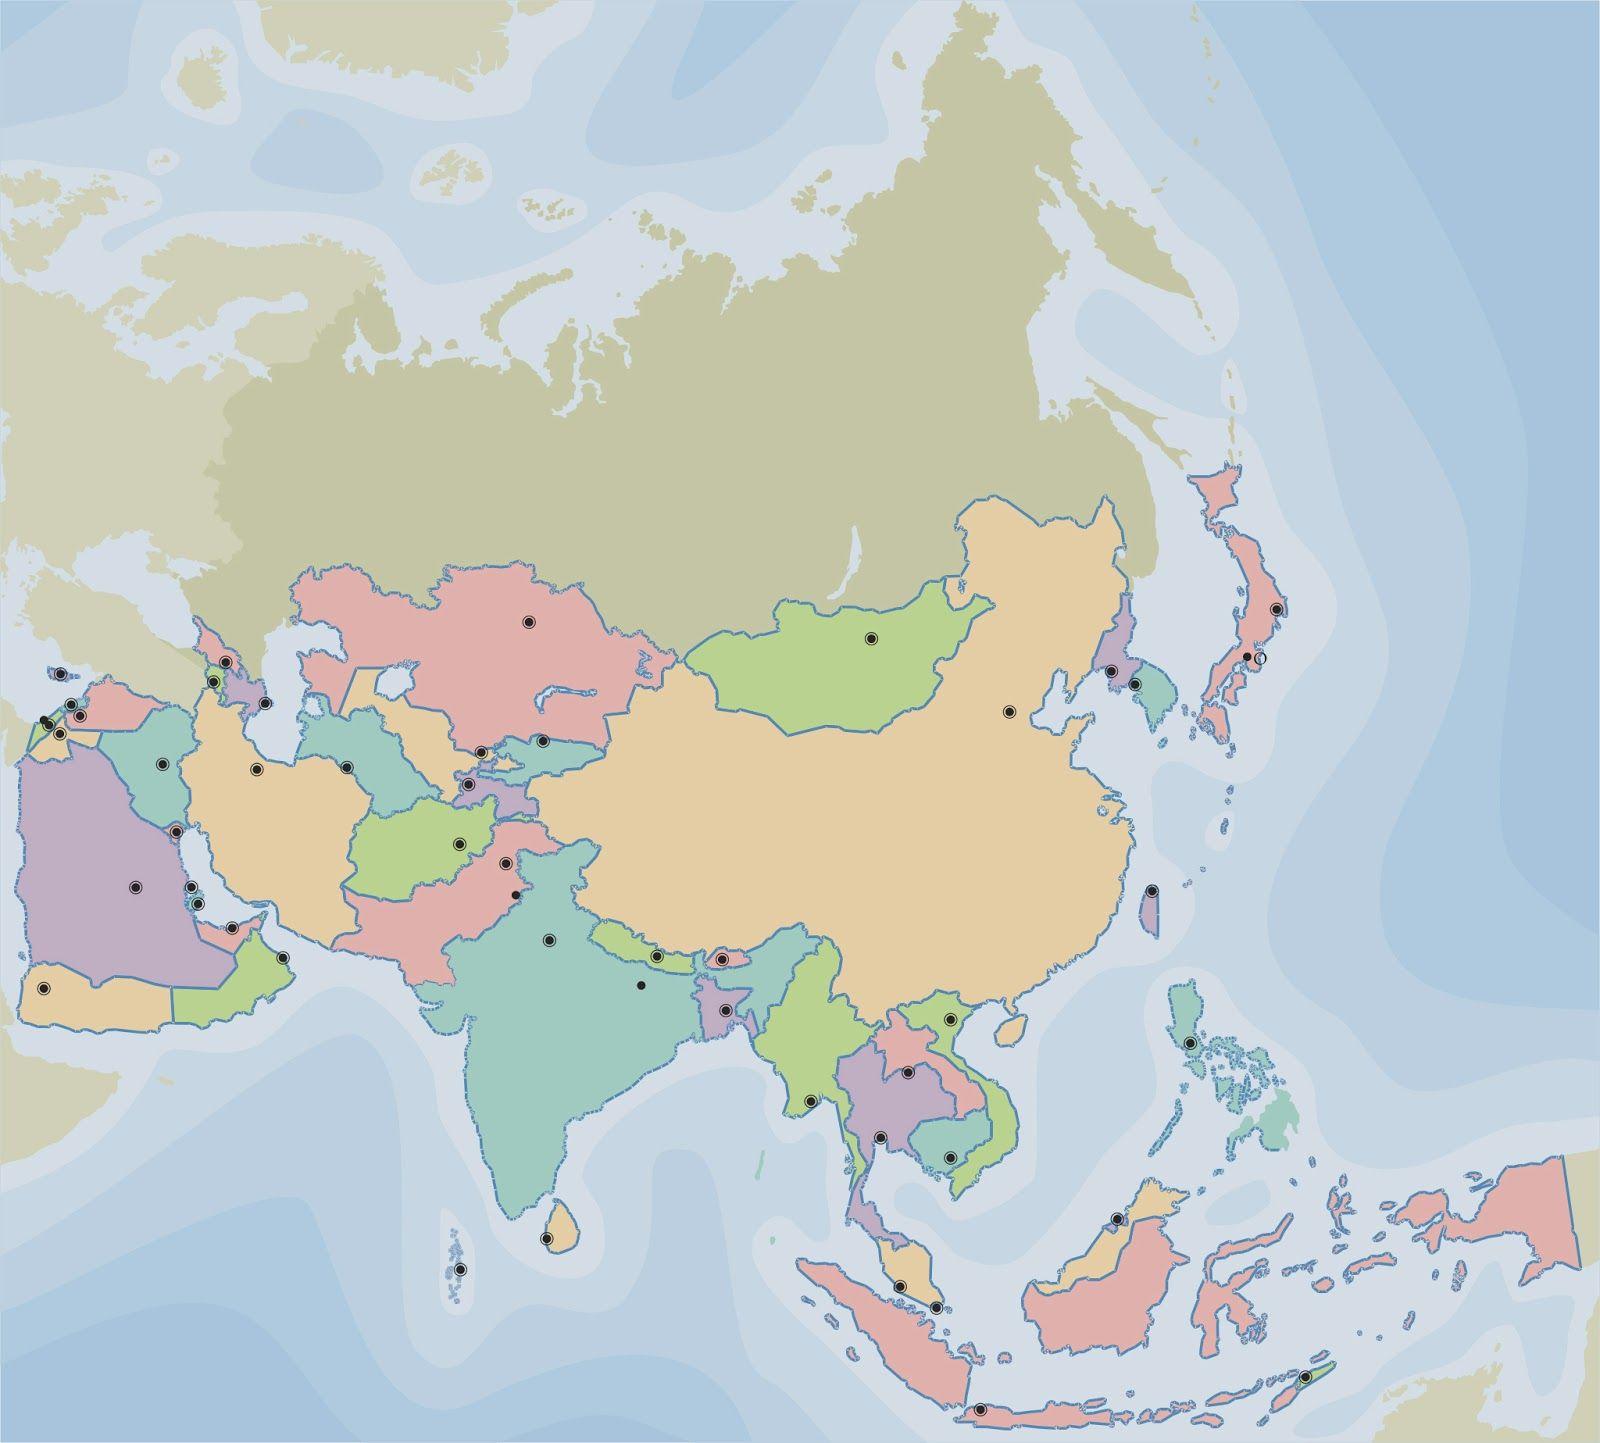 Mapa Politico De Asia Paises Y Capitales Mapas Mapa Politico